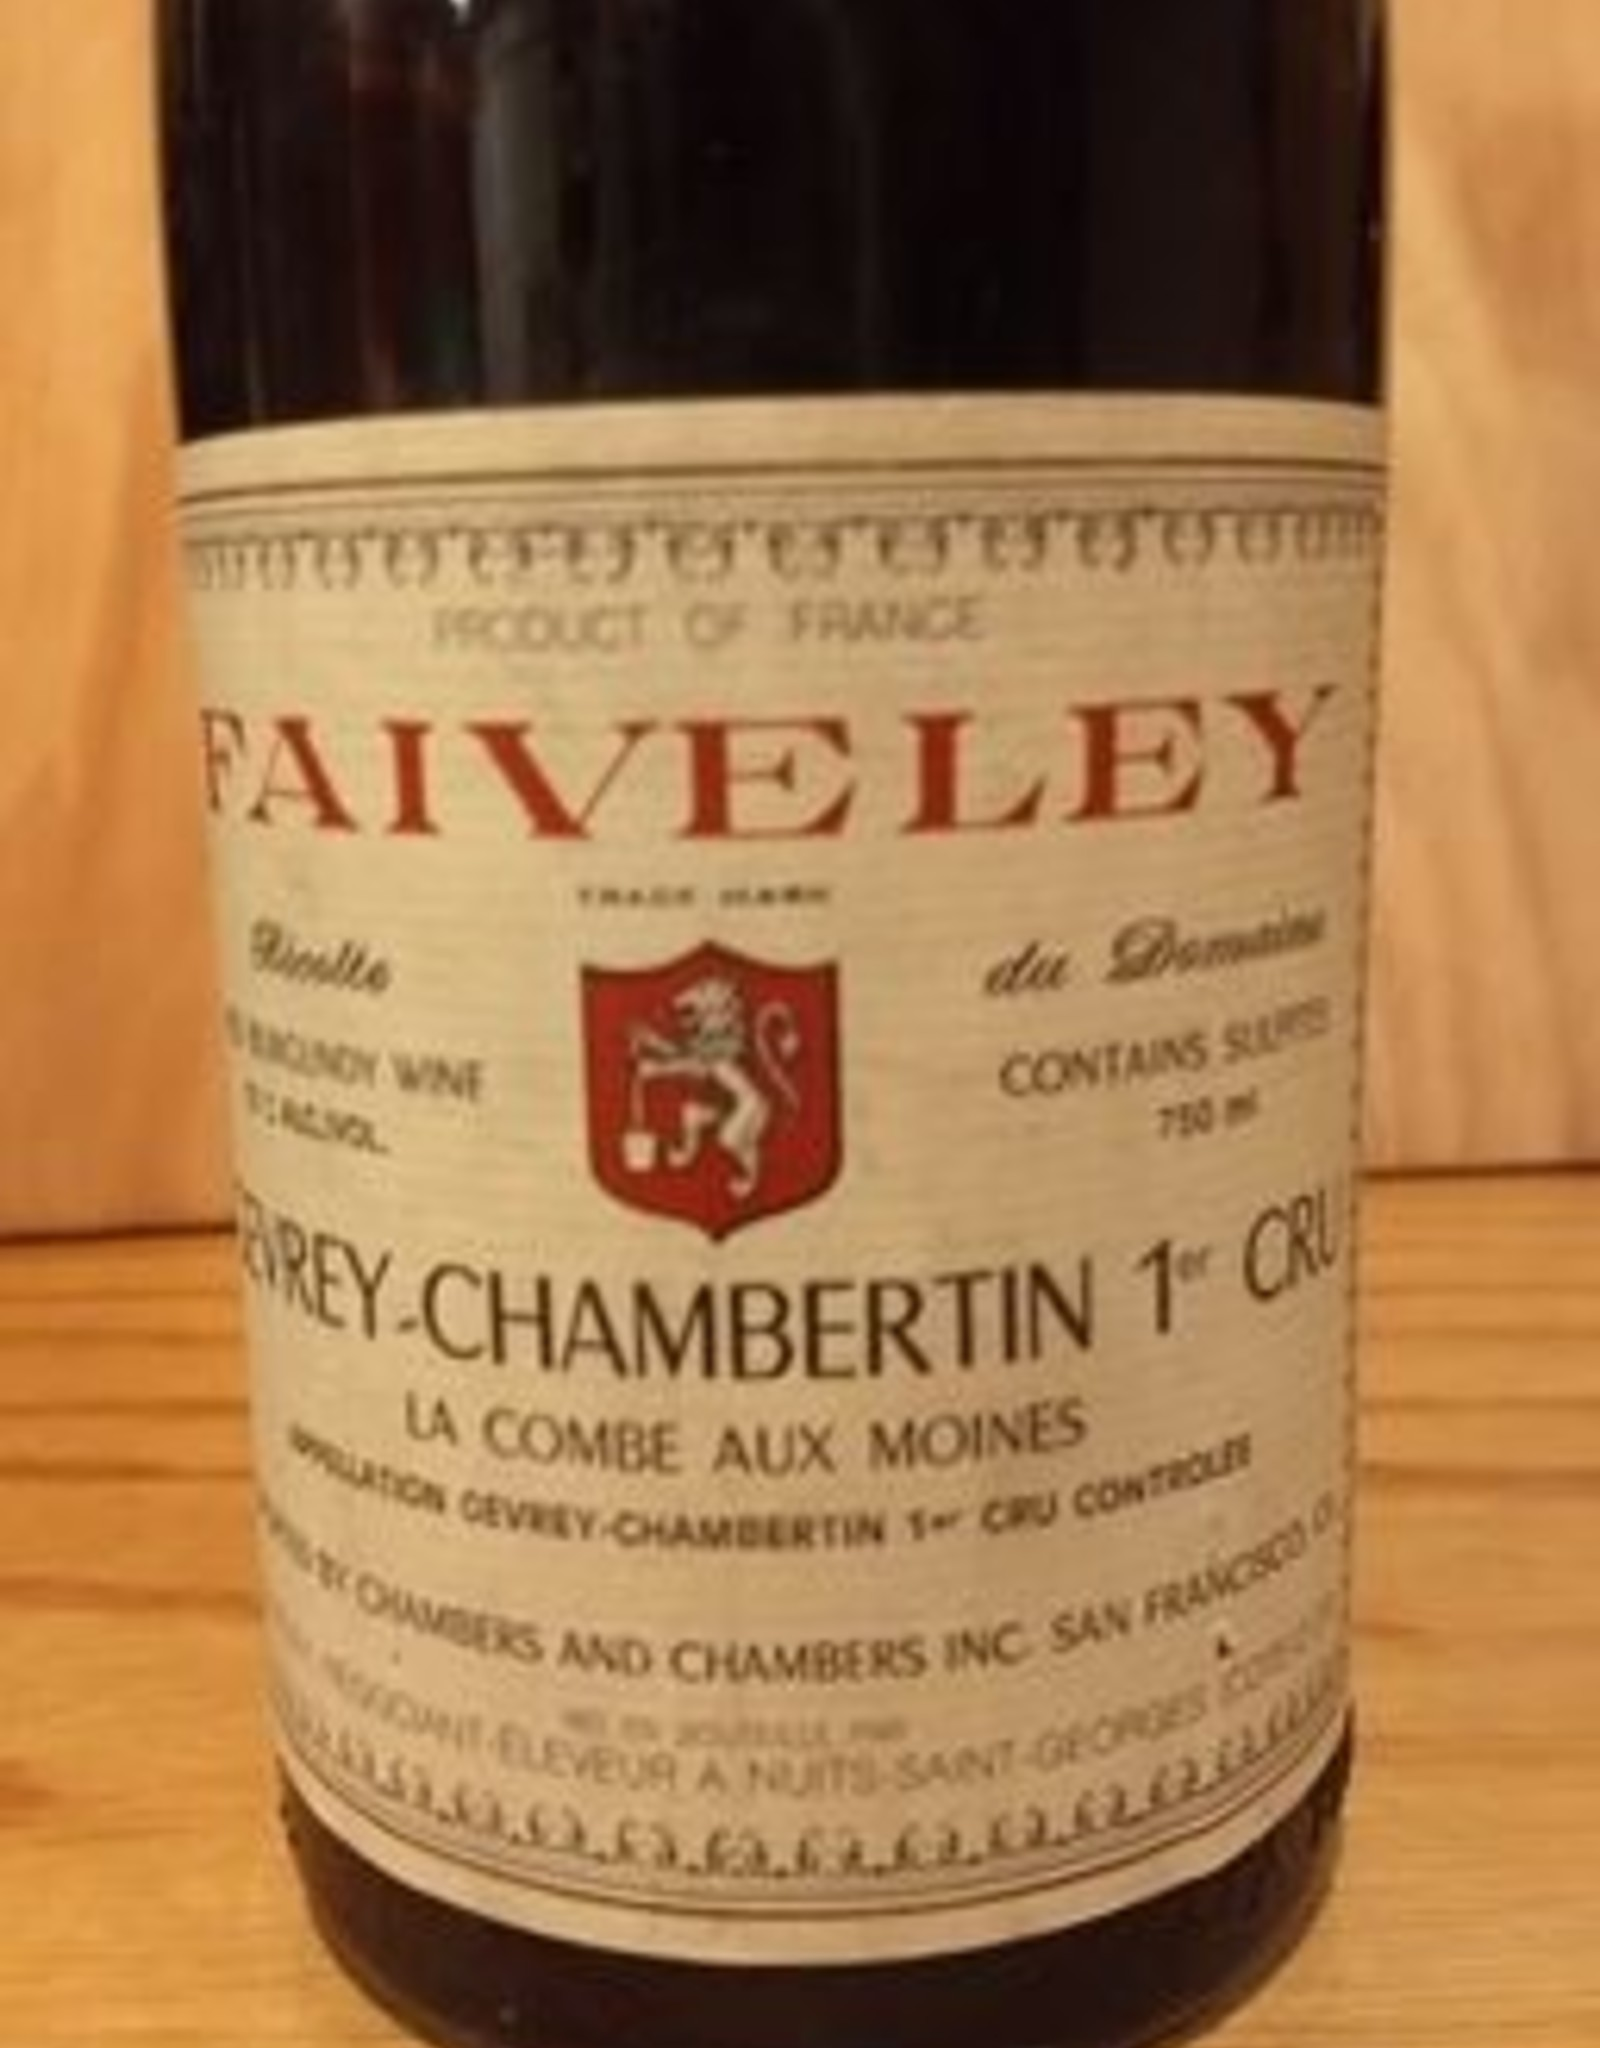 Faiveley Gevrey Chambertin 1988  1er Cru  La Combe Aux Moines